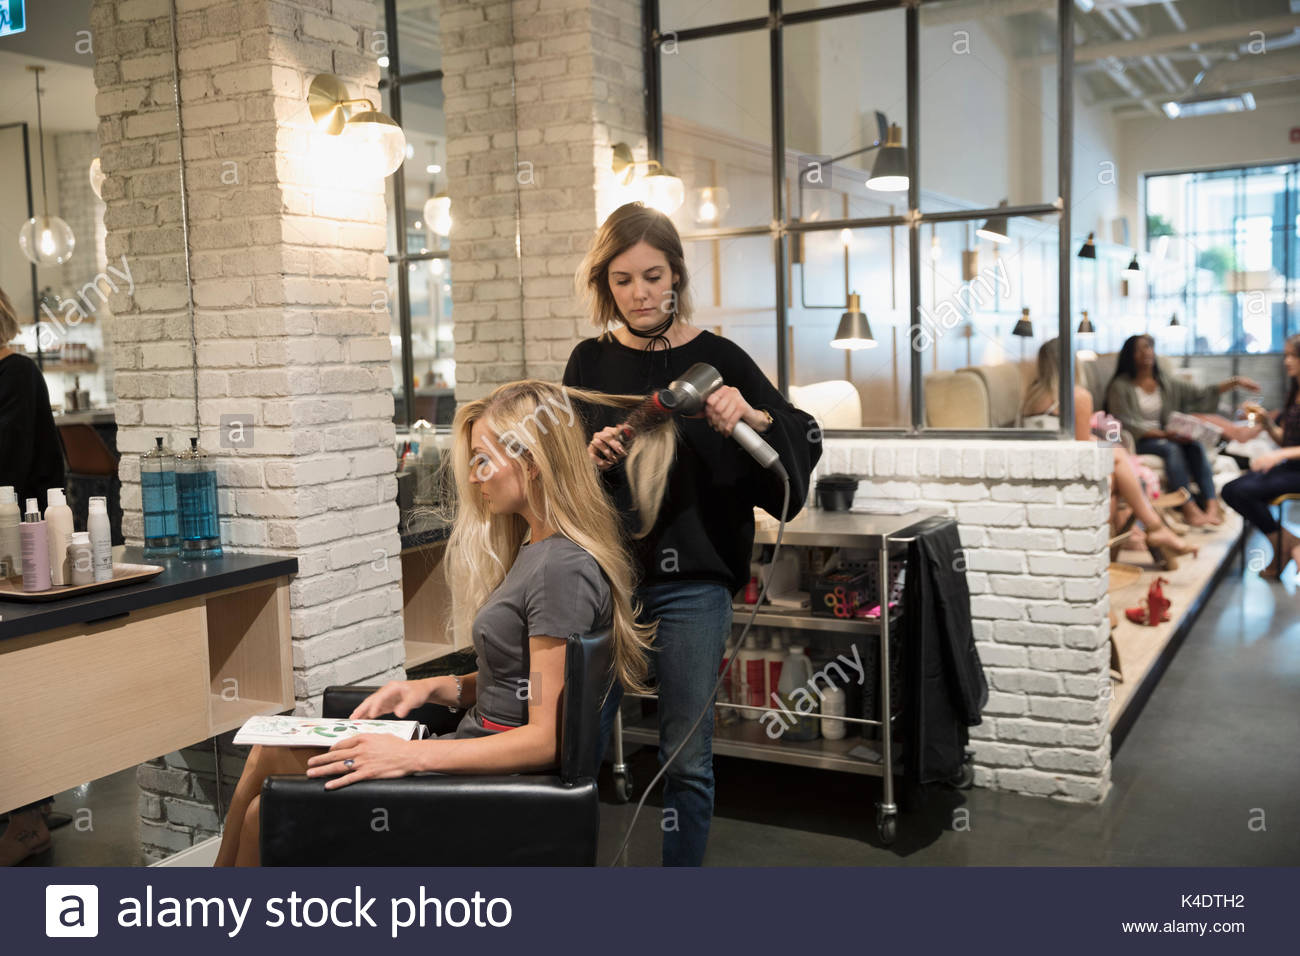 Female hair stylist blow drying hair of customer in hair salon - Stock Image